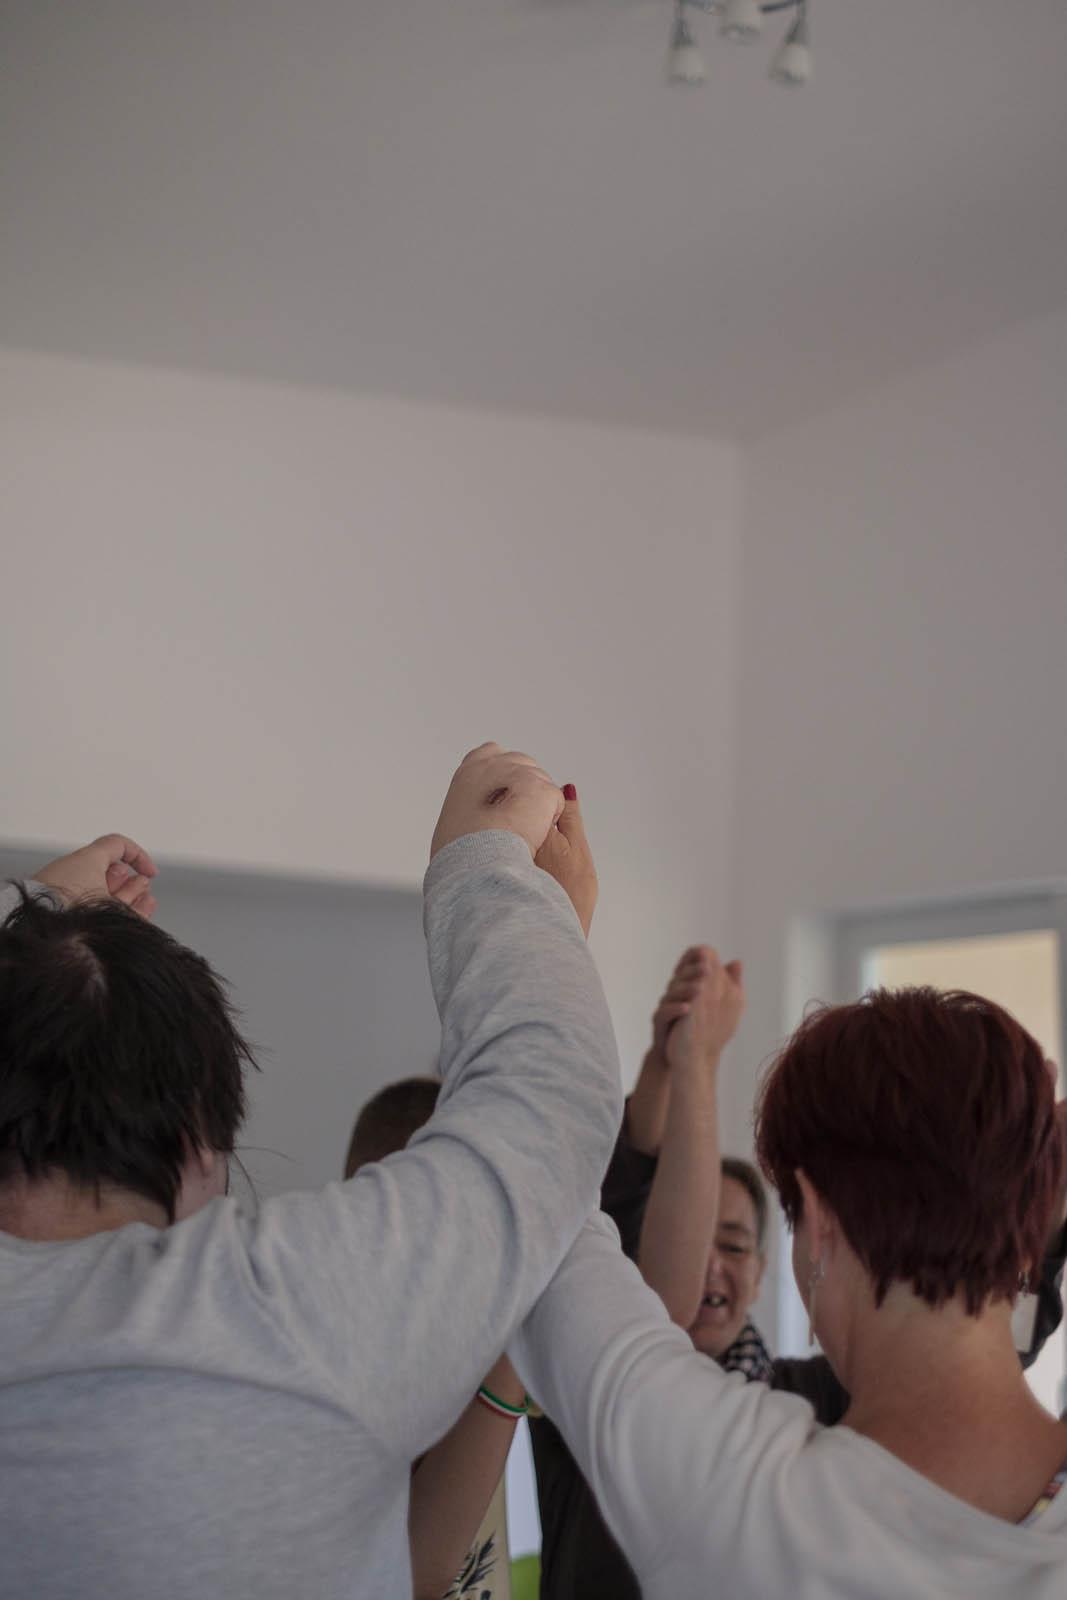 Patrónus-ház home for young people with autism in Gödöllő, Hungary